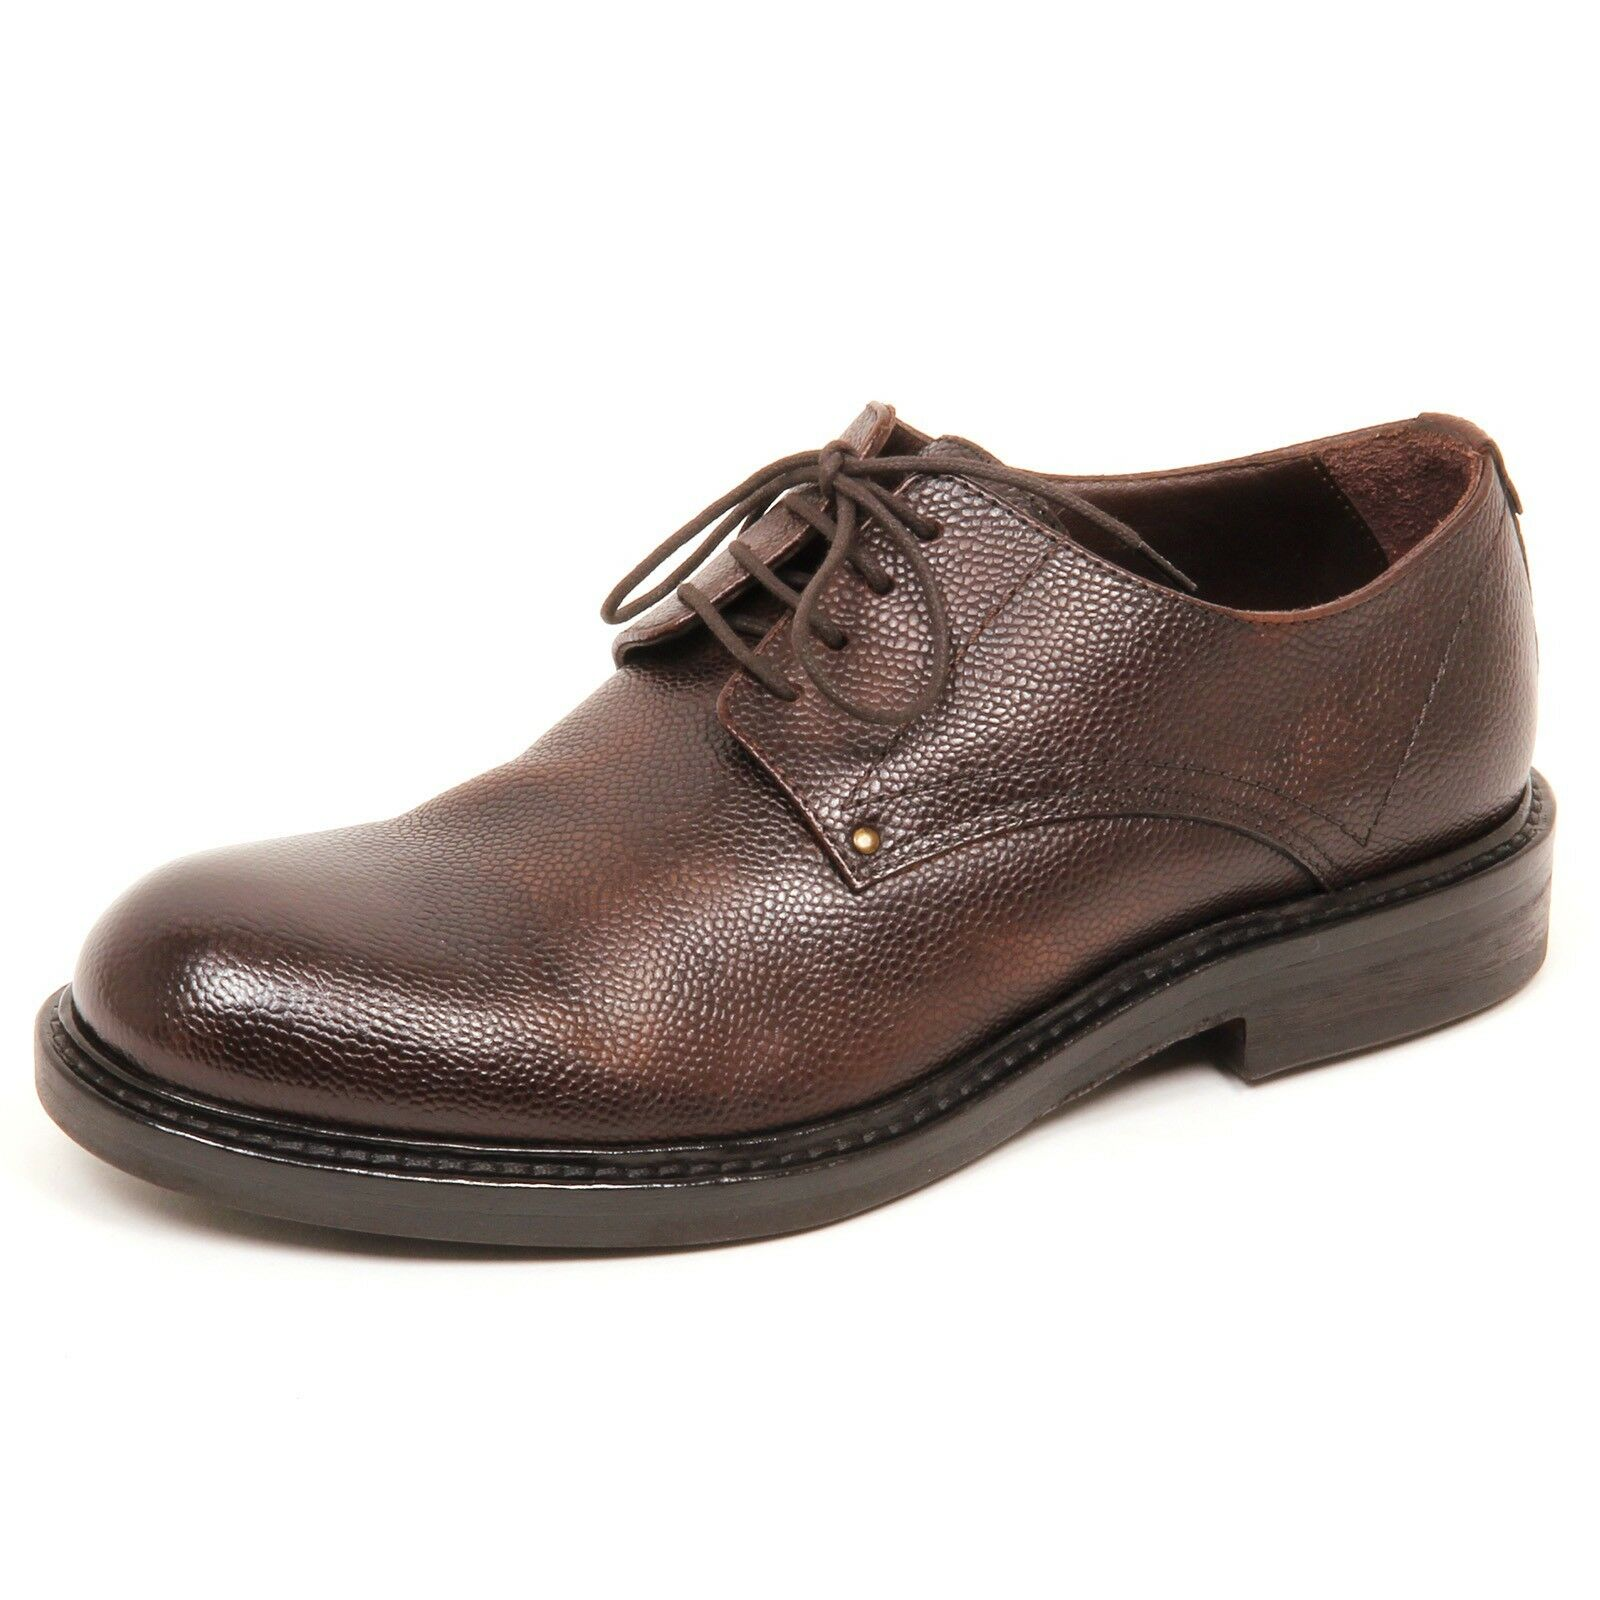 E0652 scarpa uomo brown HUNDRED 100 scarpe vintage shoe man